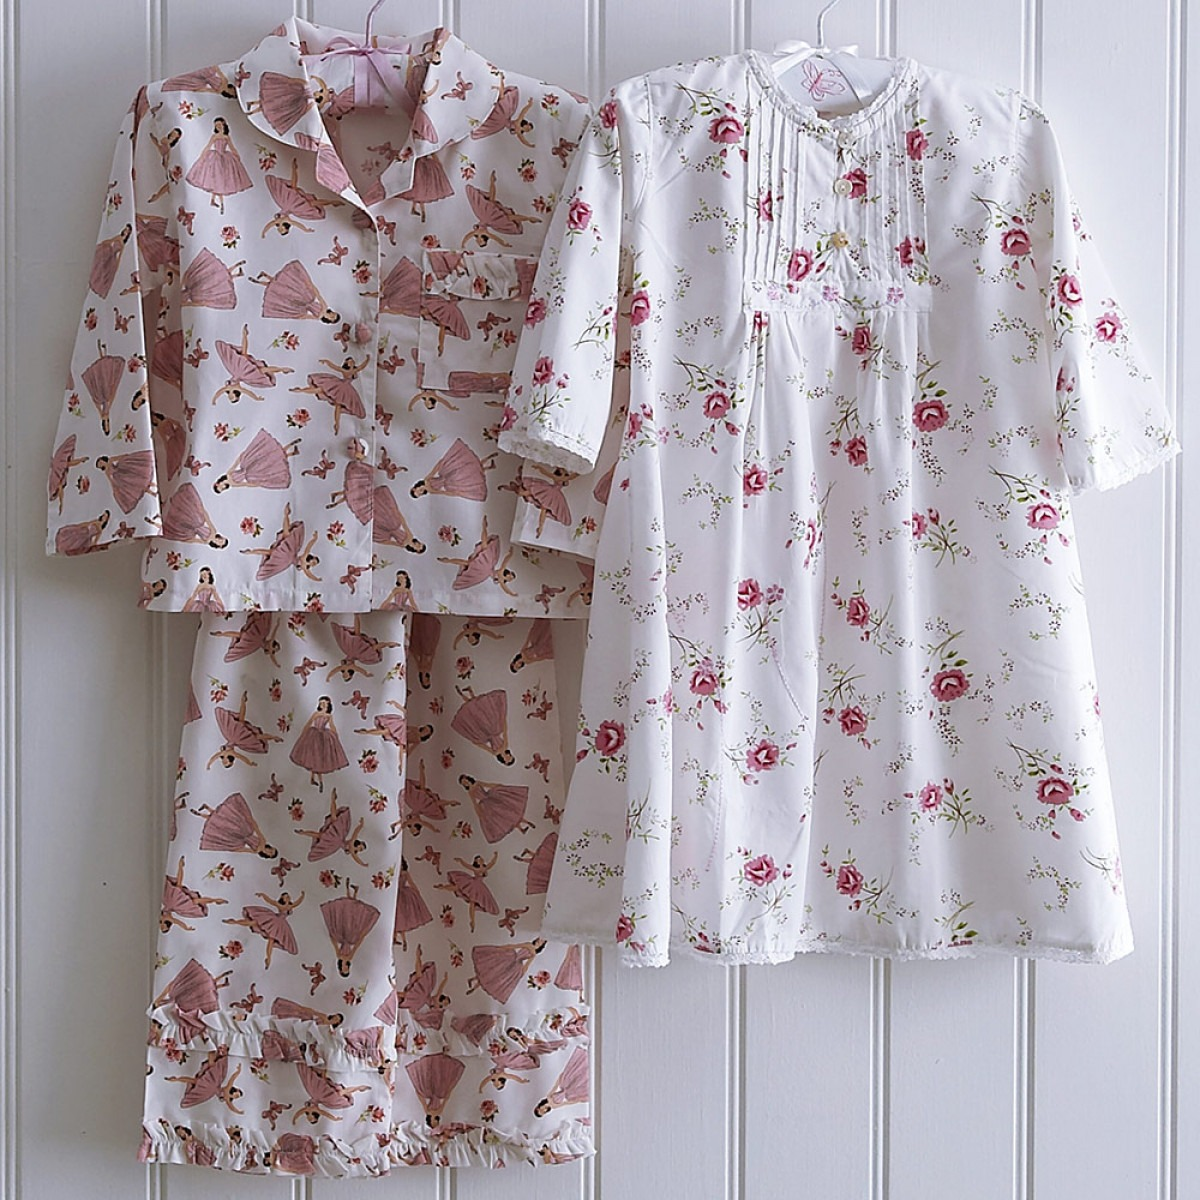 Rosy nighdress and ballerina pyjamas